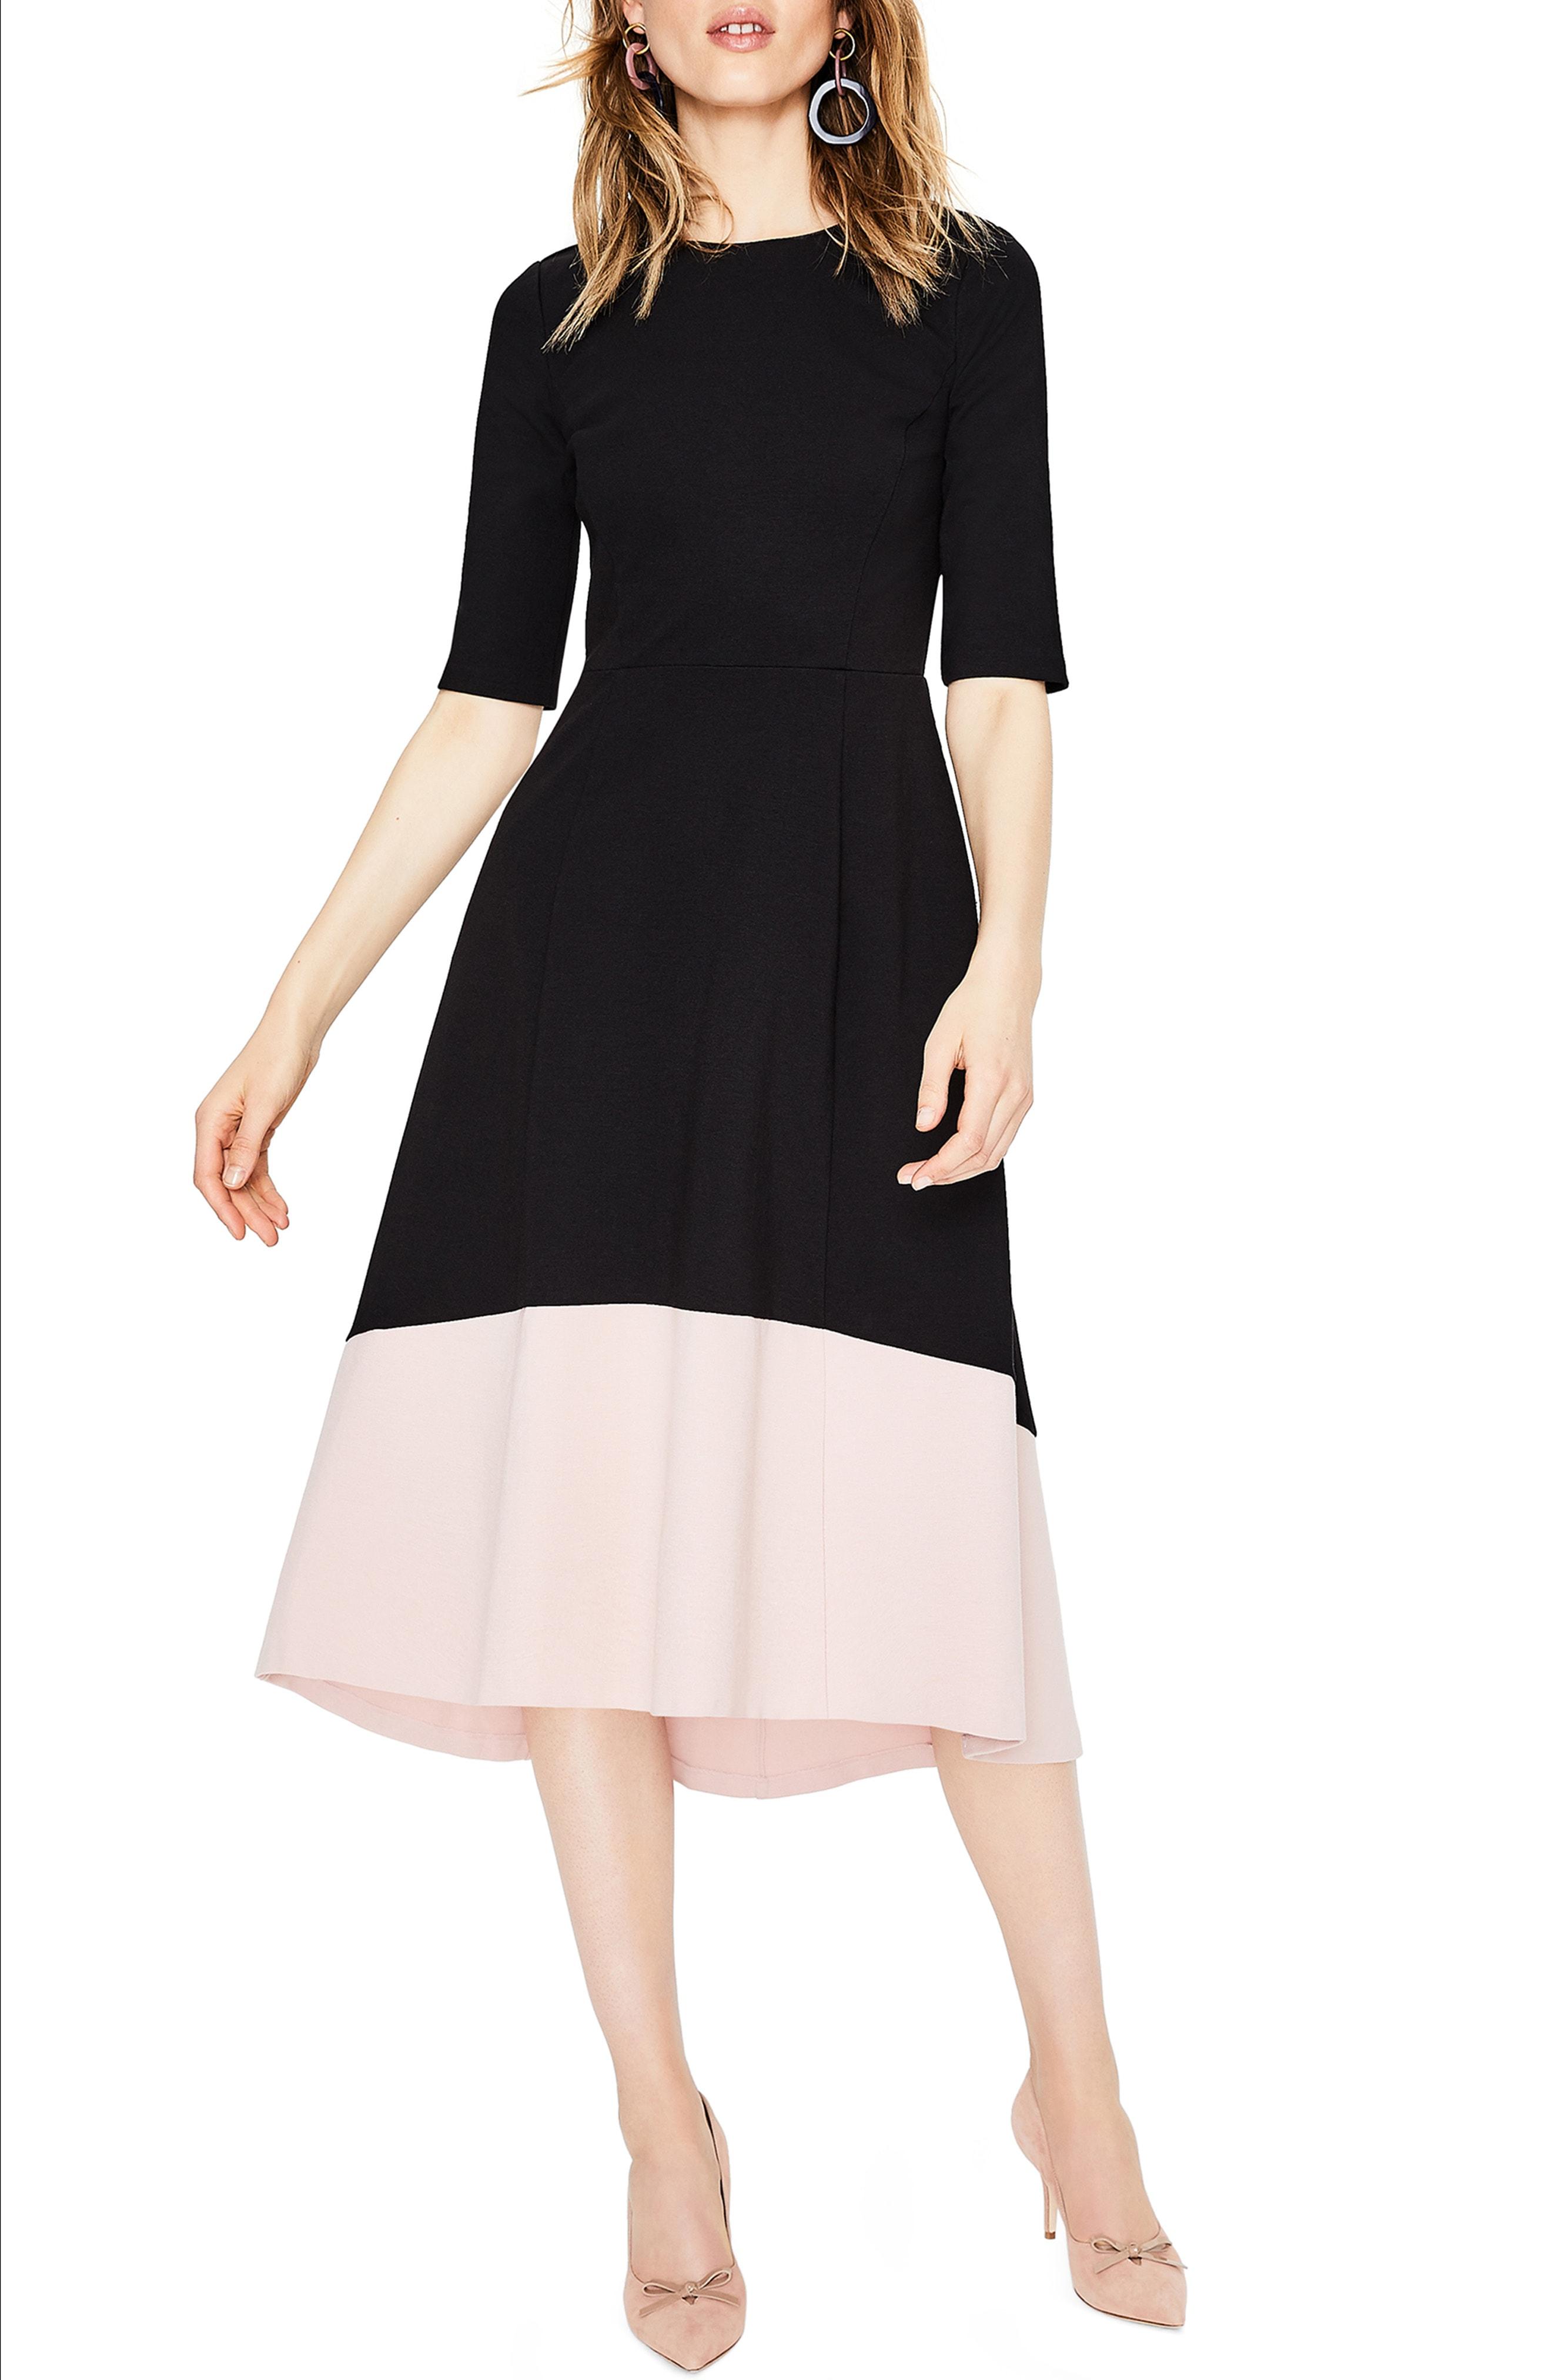 Boden Wren Colorblock Cotton Blend Ponte Dress